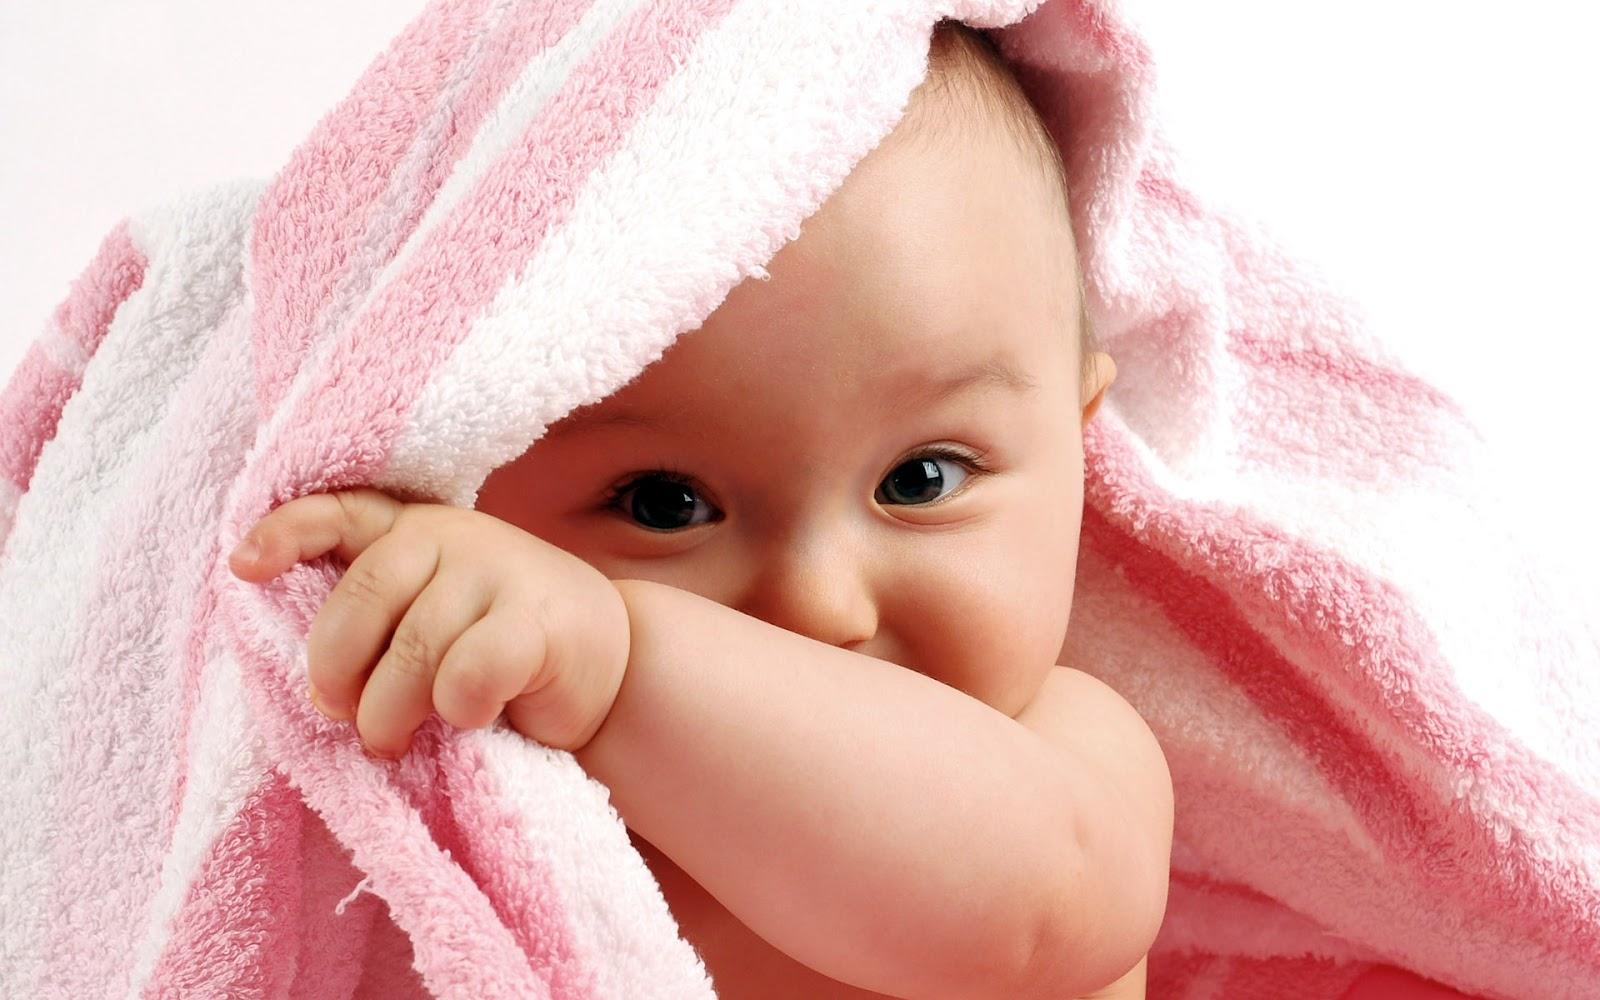 hd bebek resimleri rooteto+%252853%2529 30 En Güzel HD Kalite Bebek Resimleri moda_trend